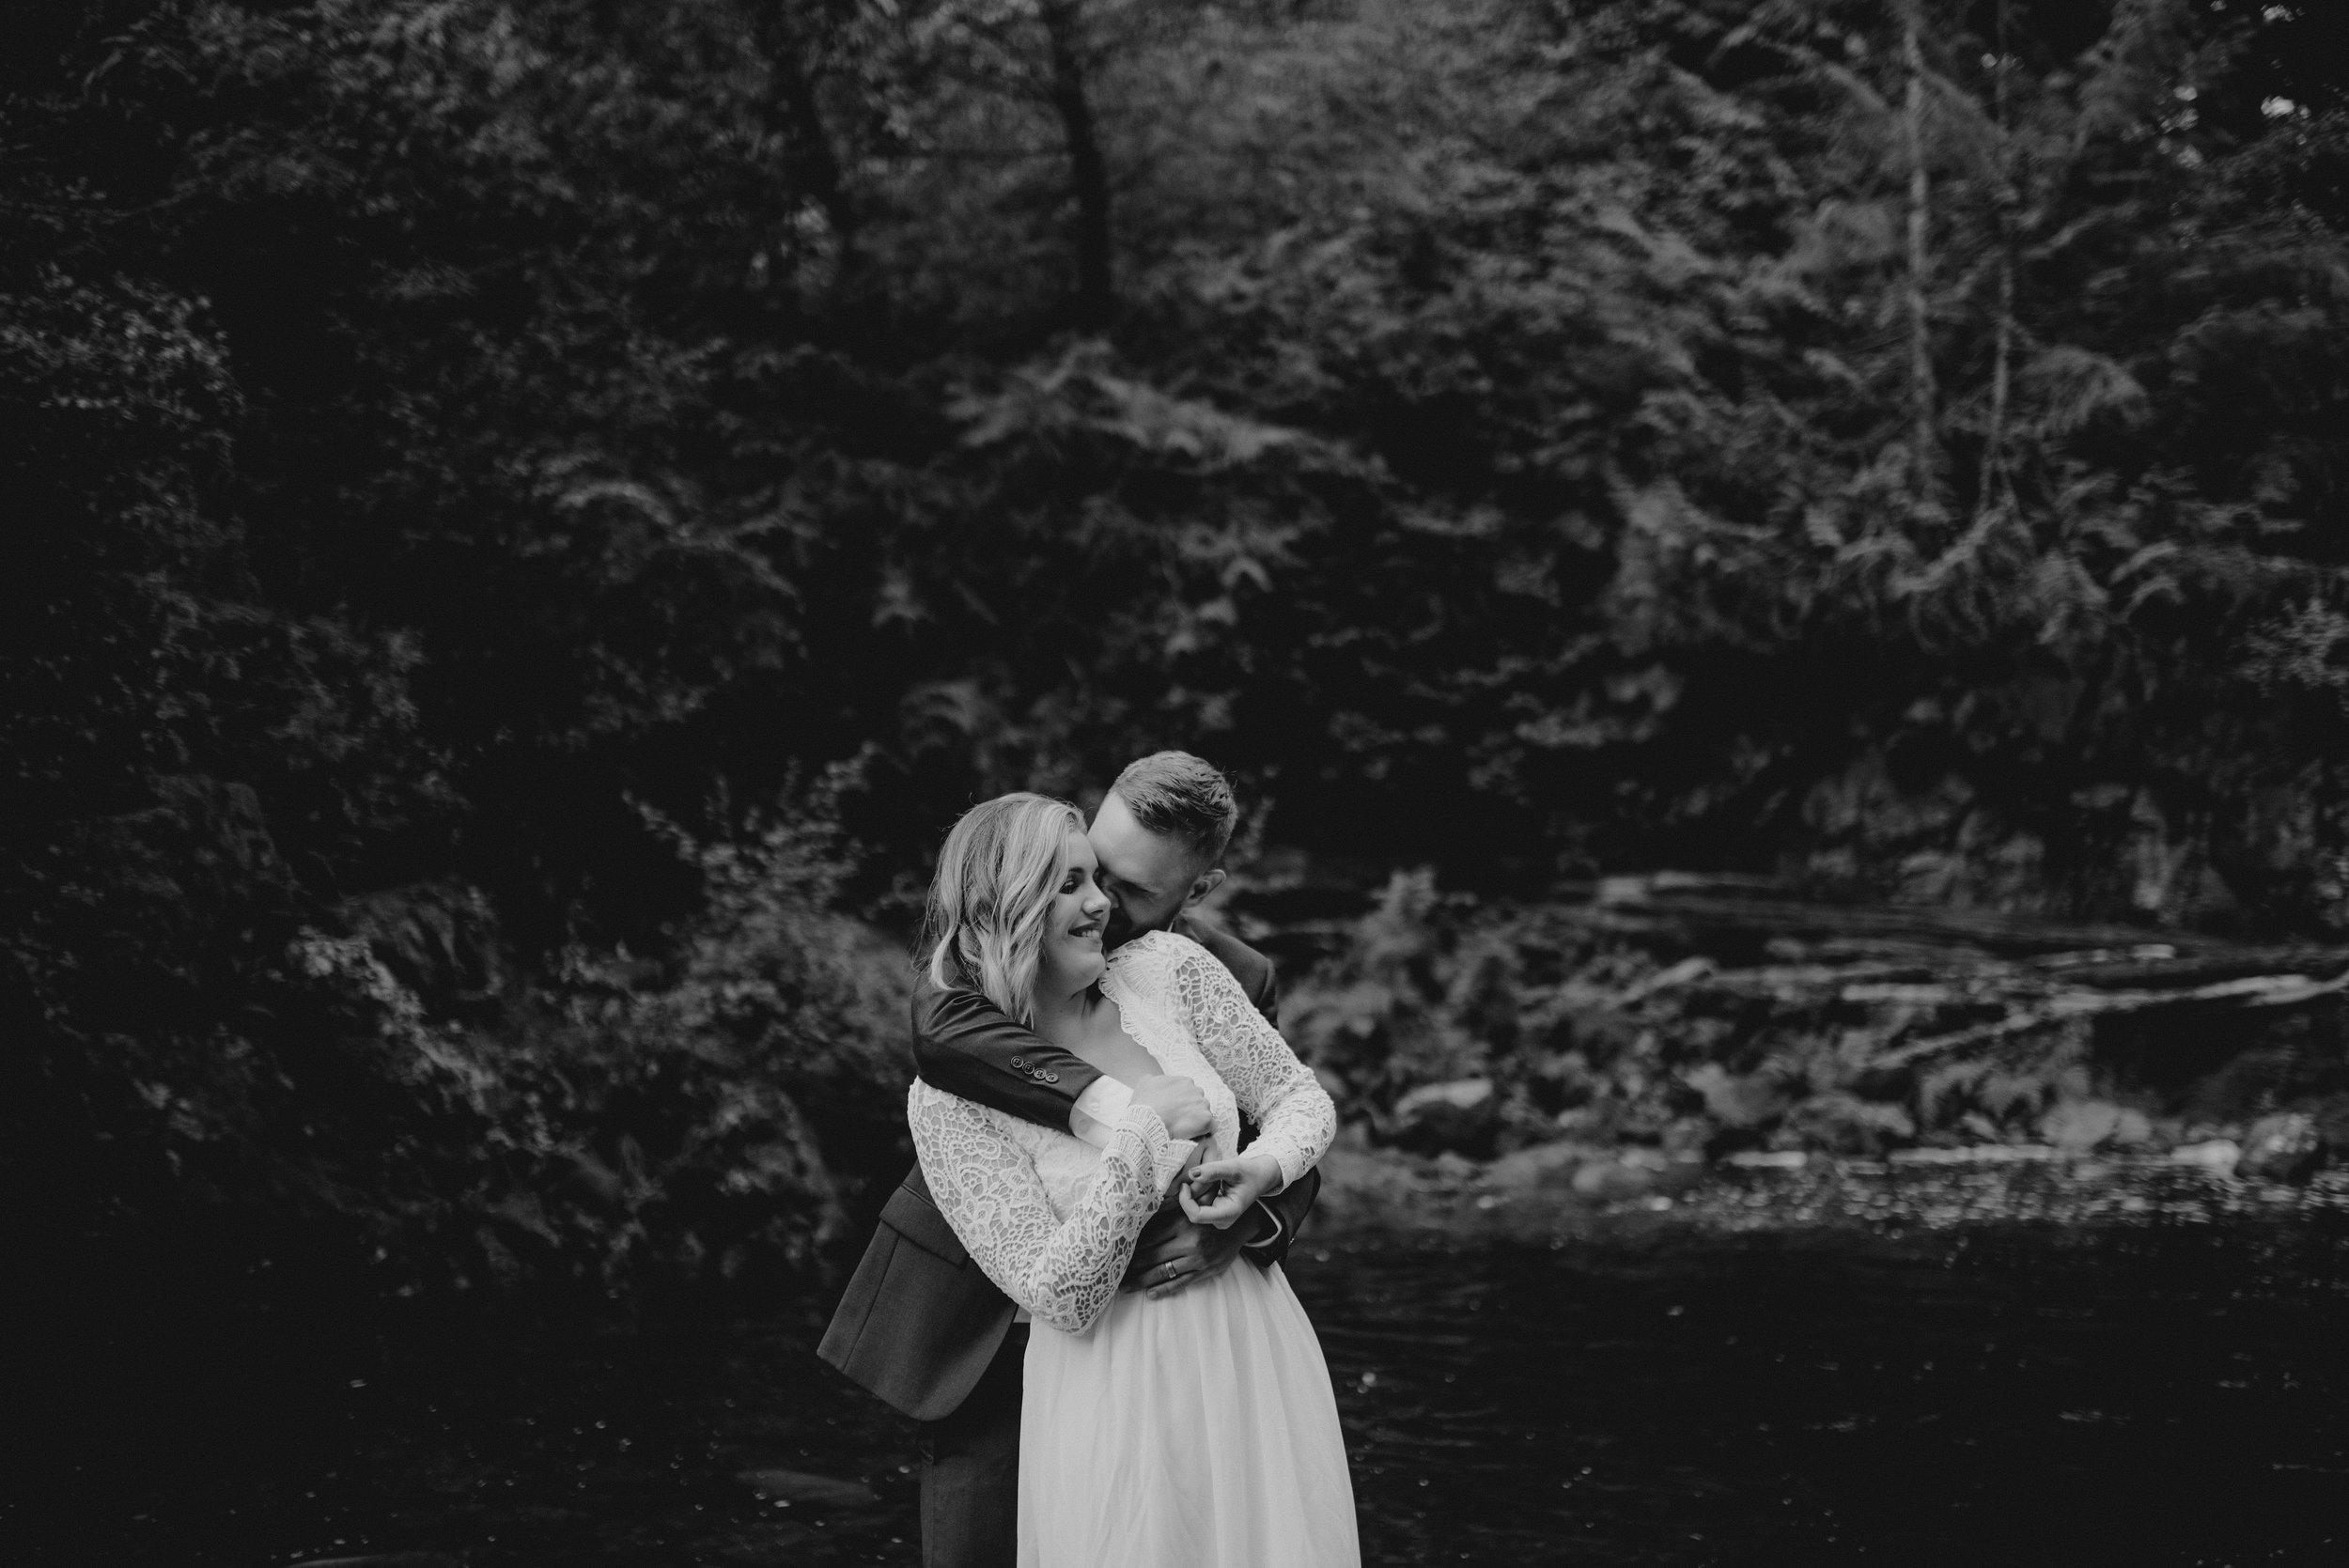 Taylor Leigh Photography